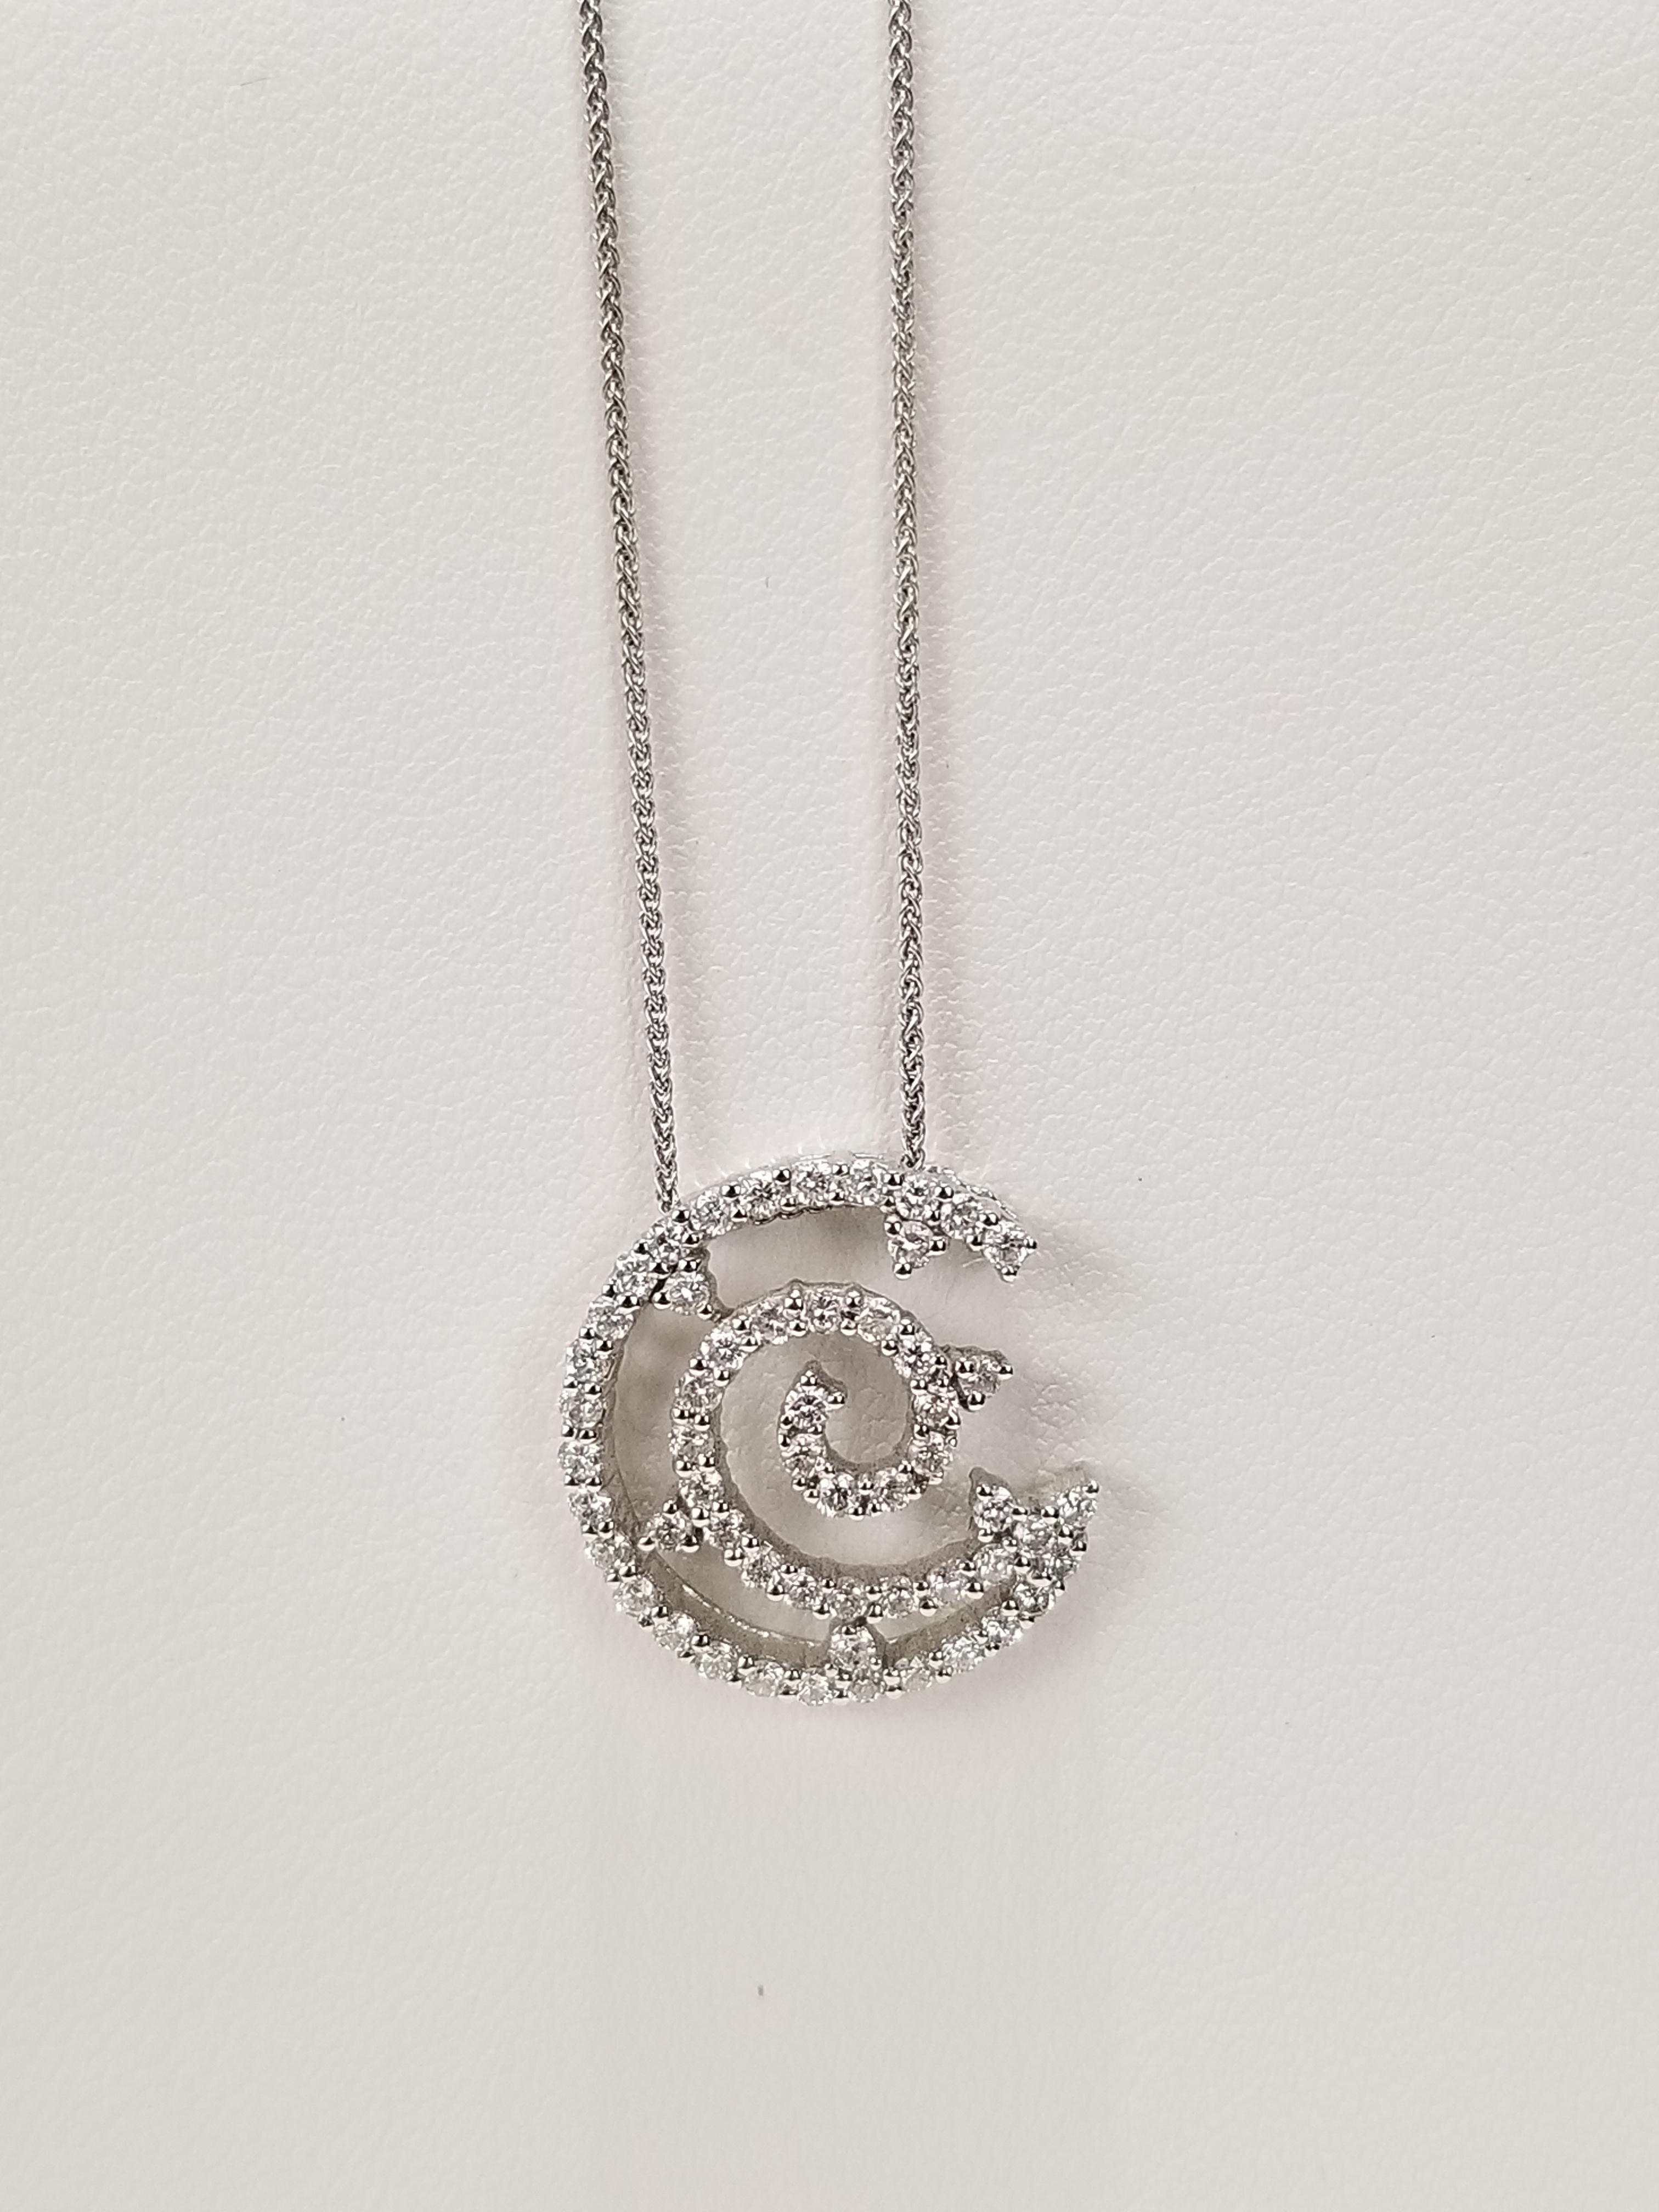 18K White Gold Diamonds 0.80ct Regular Price $4550 SALE $1250 Ref BK643